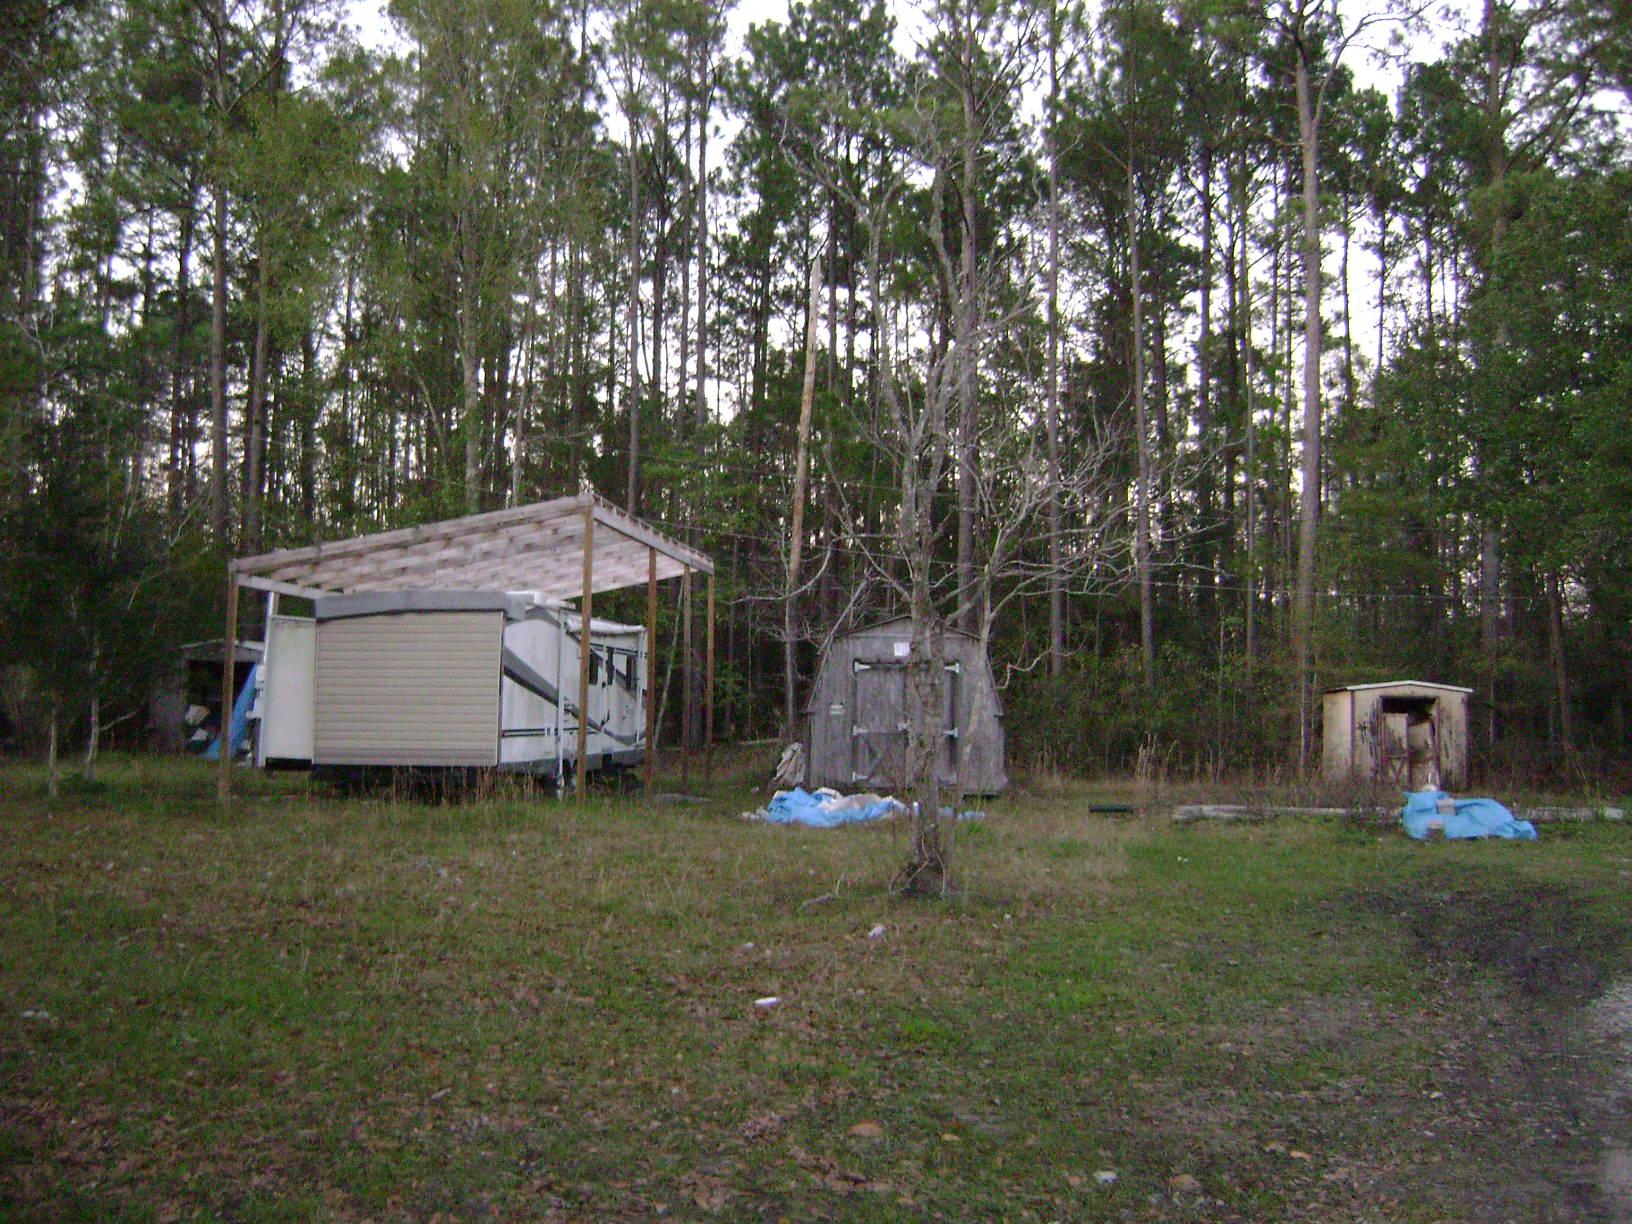 5 N. Acorn Ct, Pearl River, Louisiana 70452